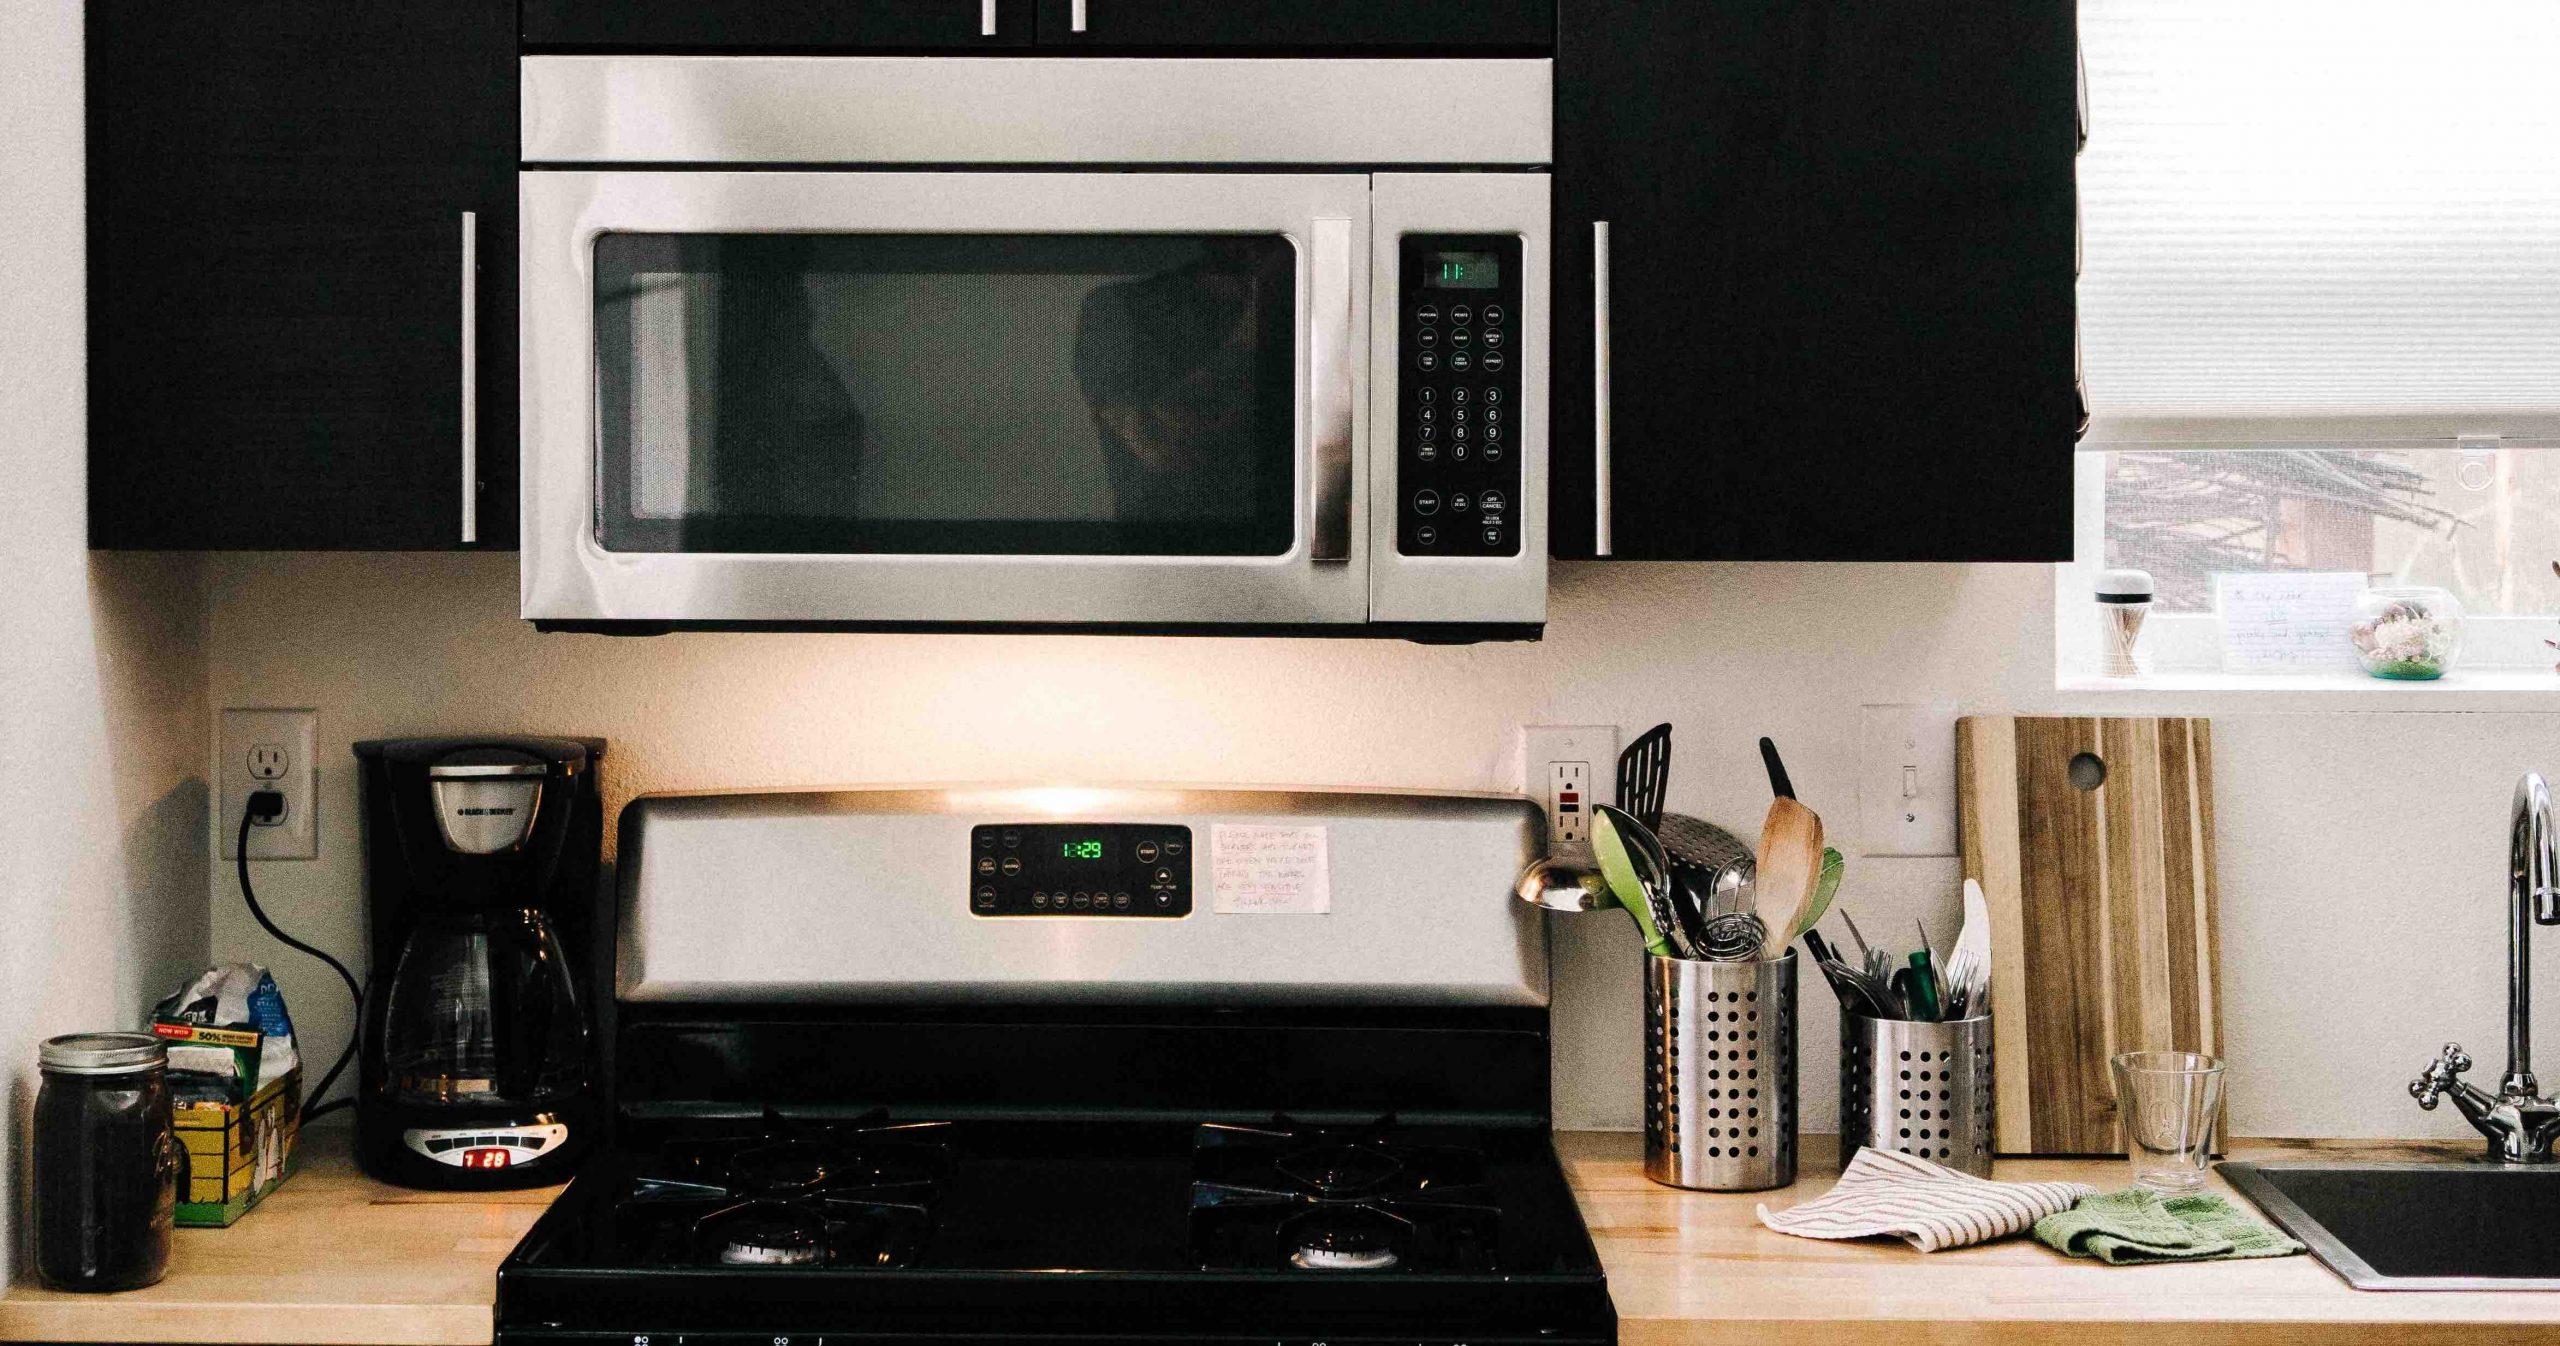 Panasonic Mikrowelle: Test & Empfehlungen (03/21)